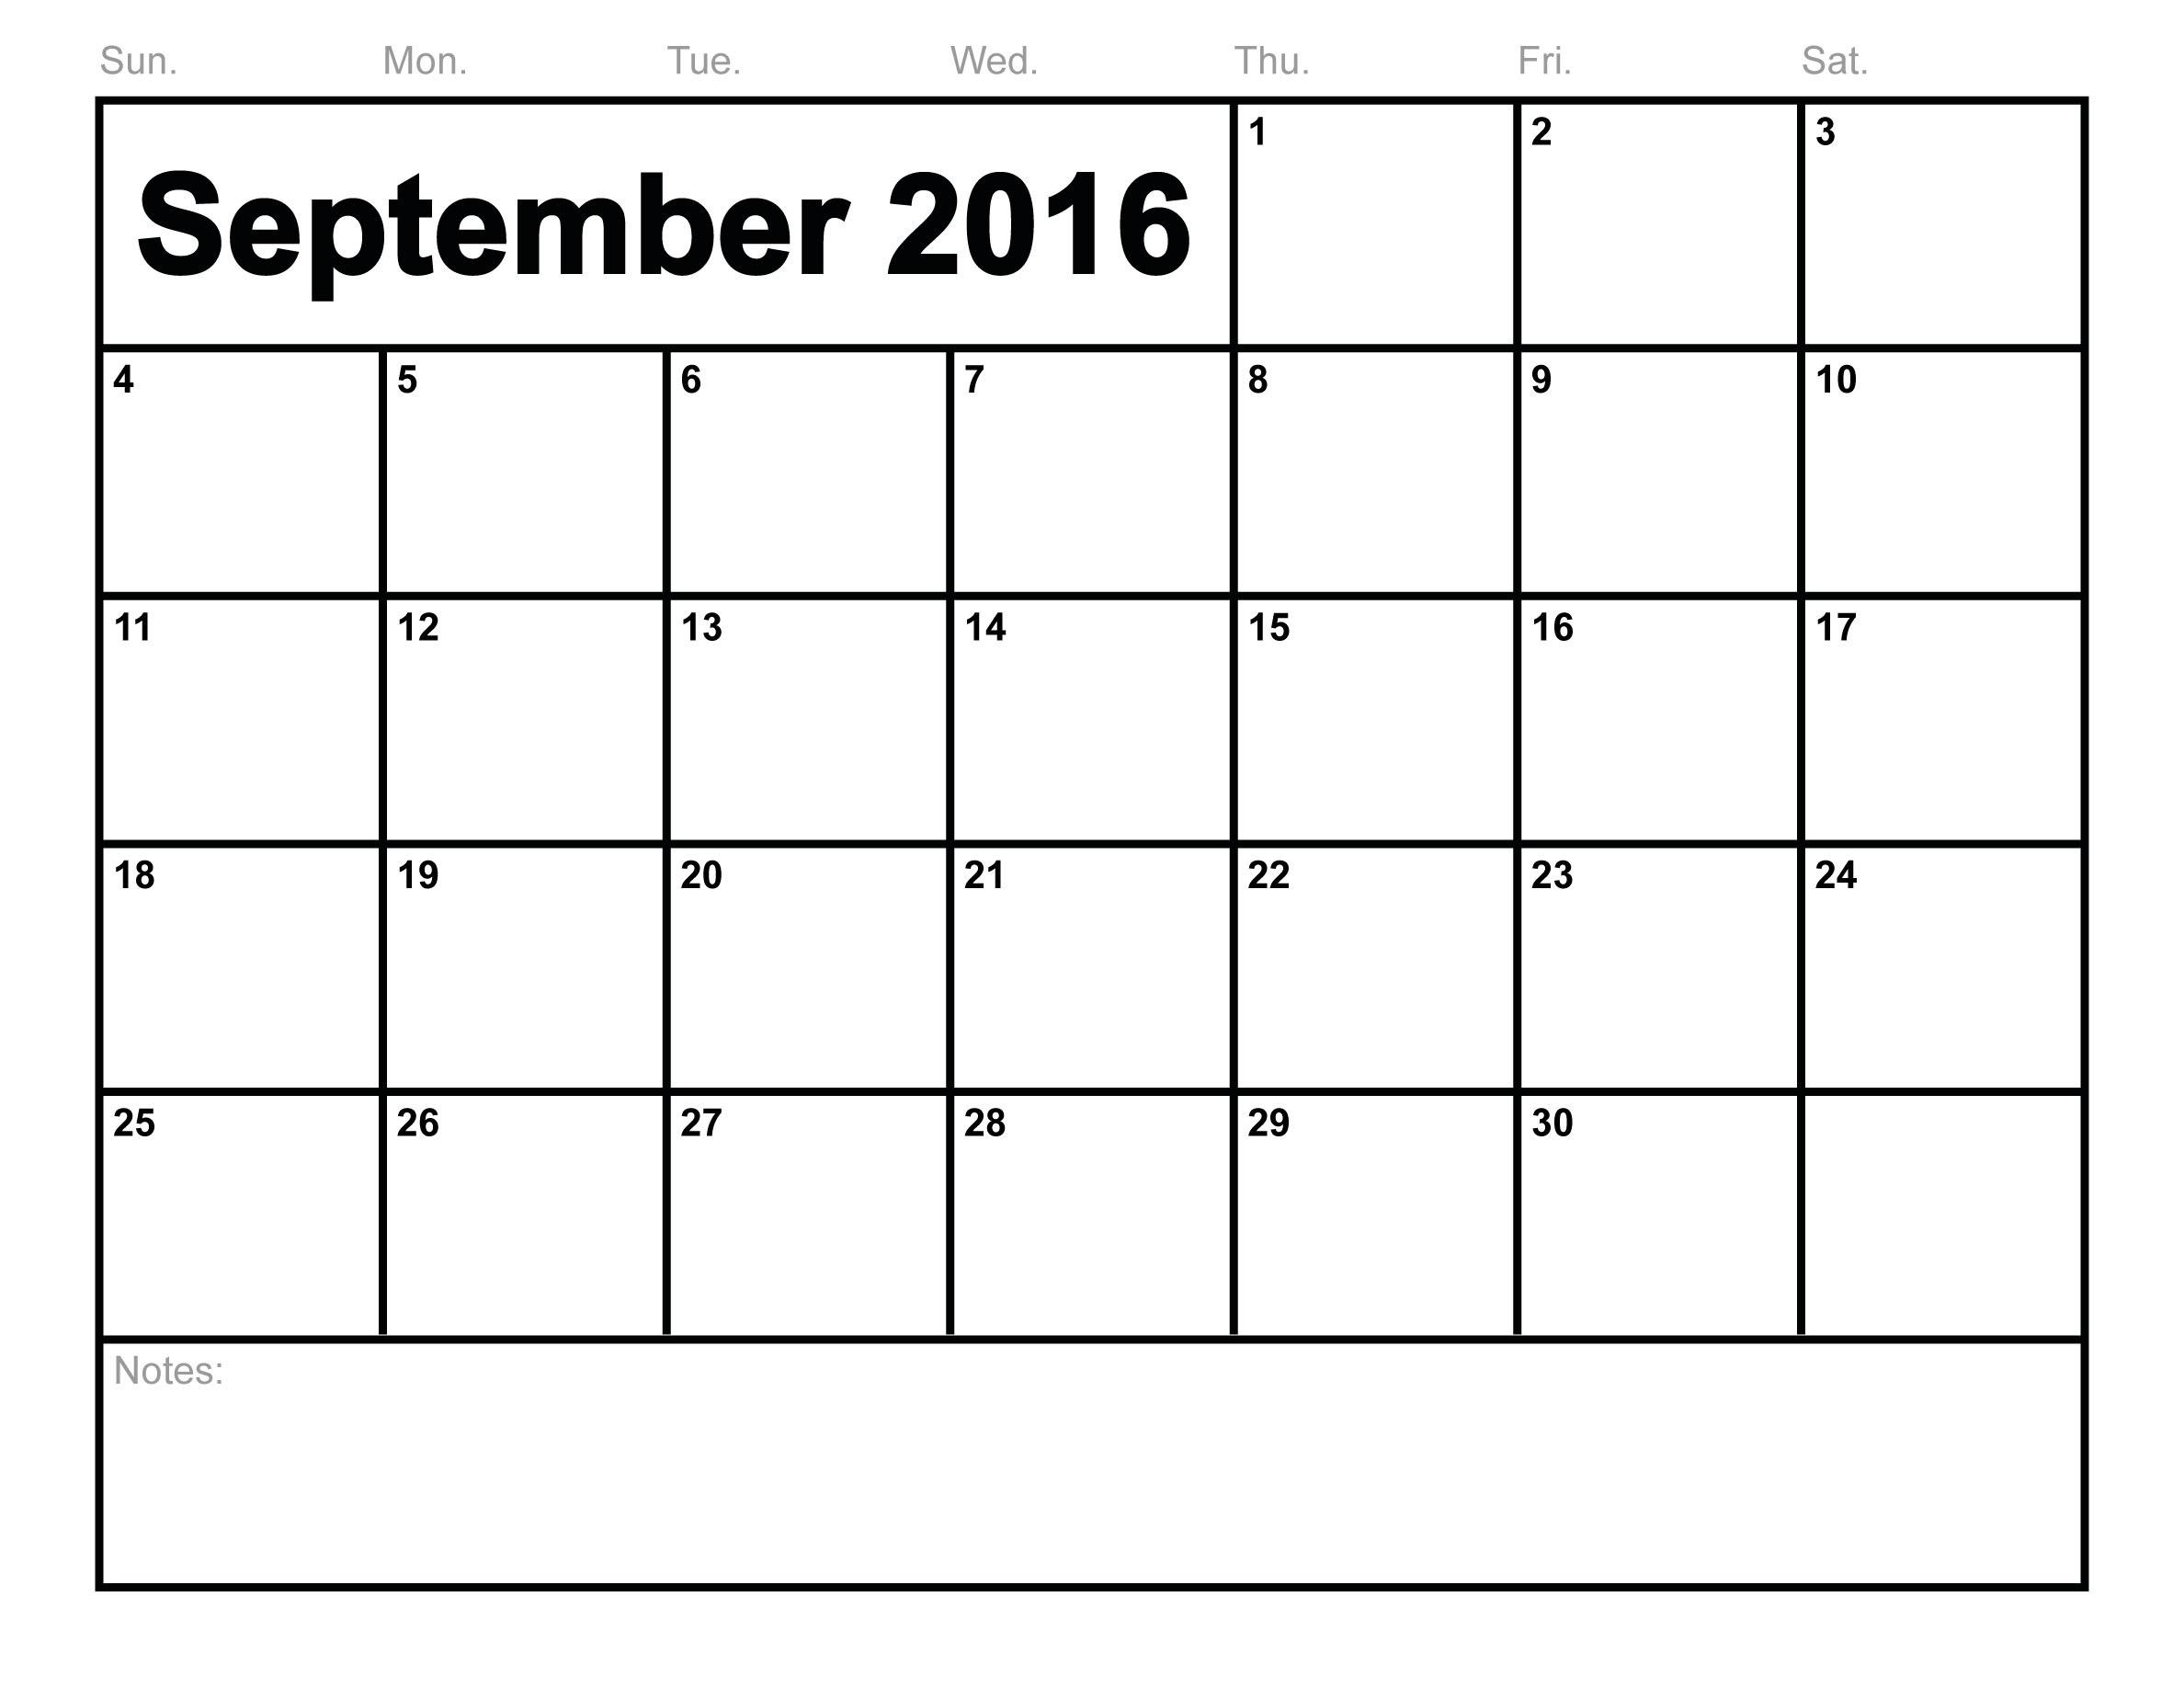 2018 September Printable Calendar Free, Blank Templates Pdf pertaining to Blank Printable September Calendar Template